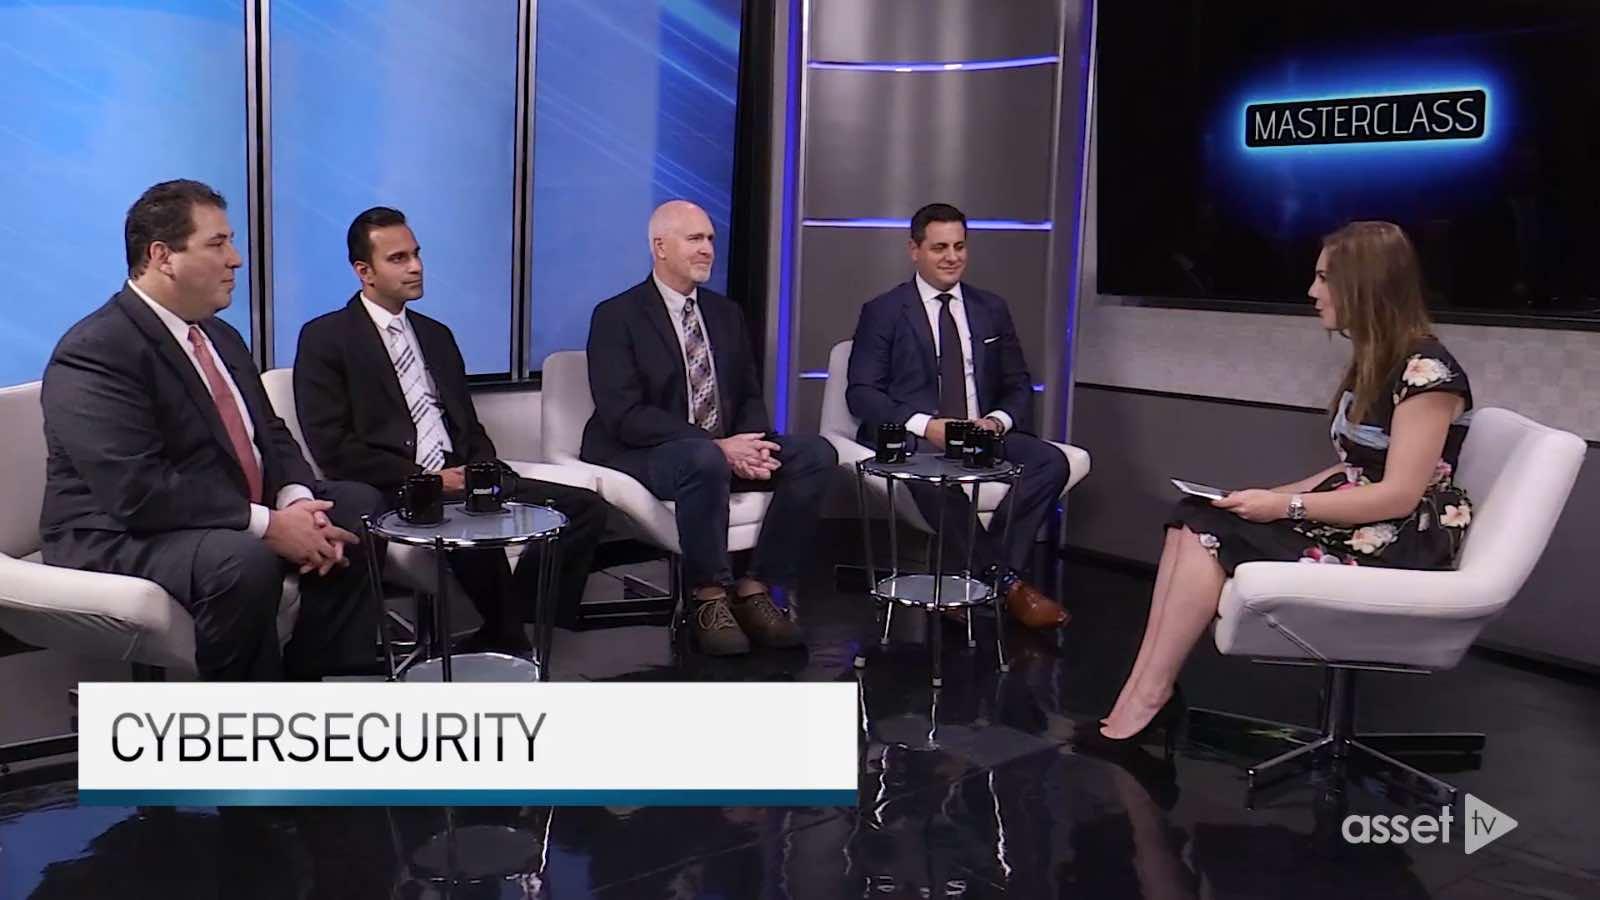 Cybersecurity MASTERCLASS Panel